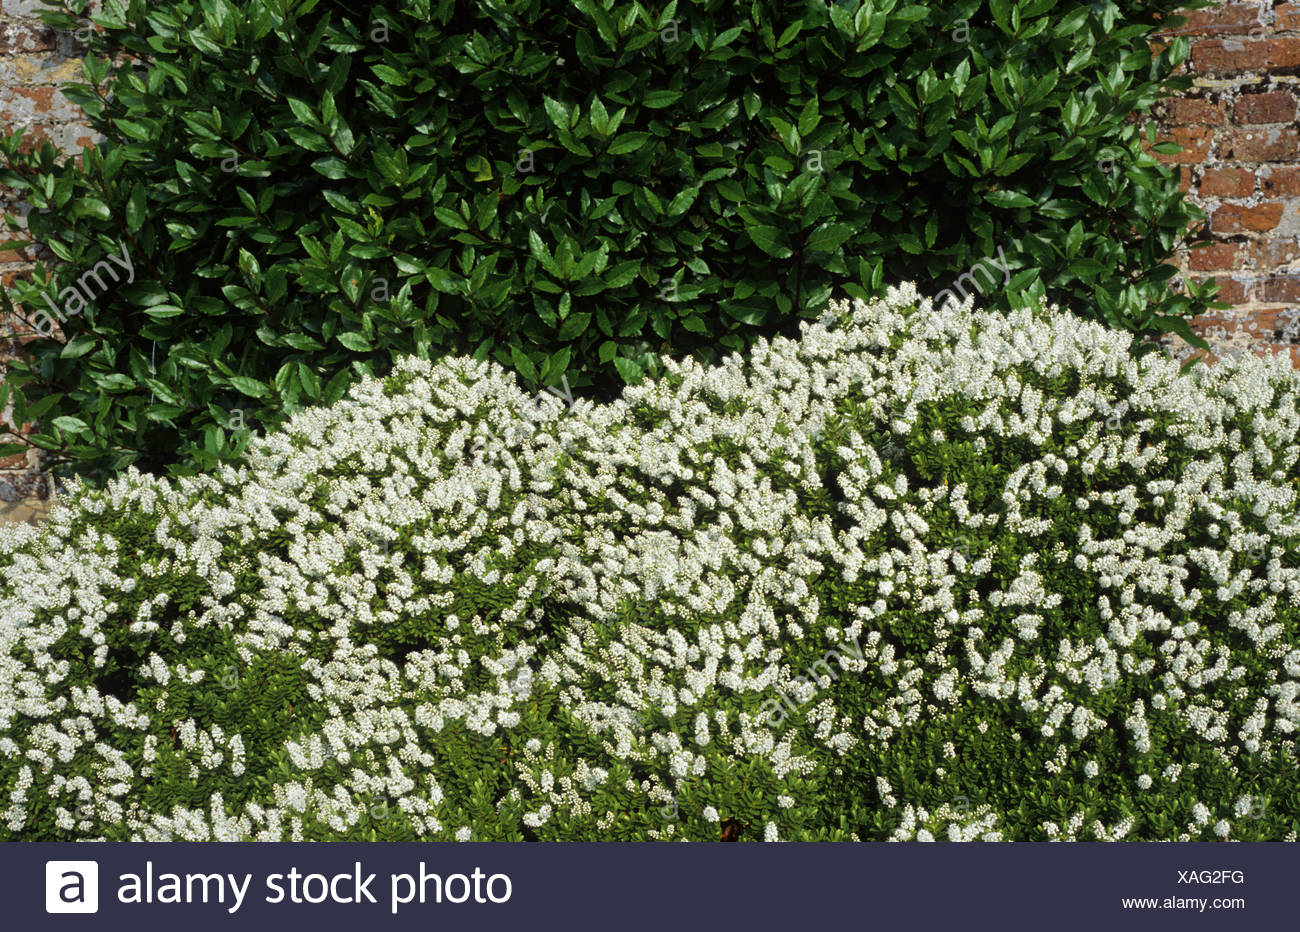 Arbusto Fiori Bianchi.Hebe Rakaiensis Fiori Bianchi Evergreen Pianta Di Giardino